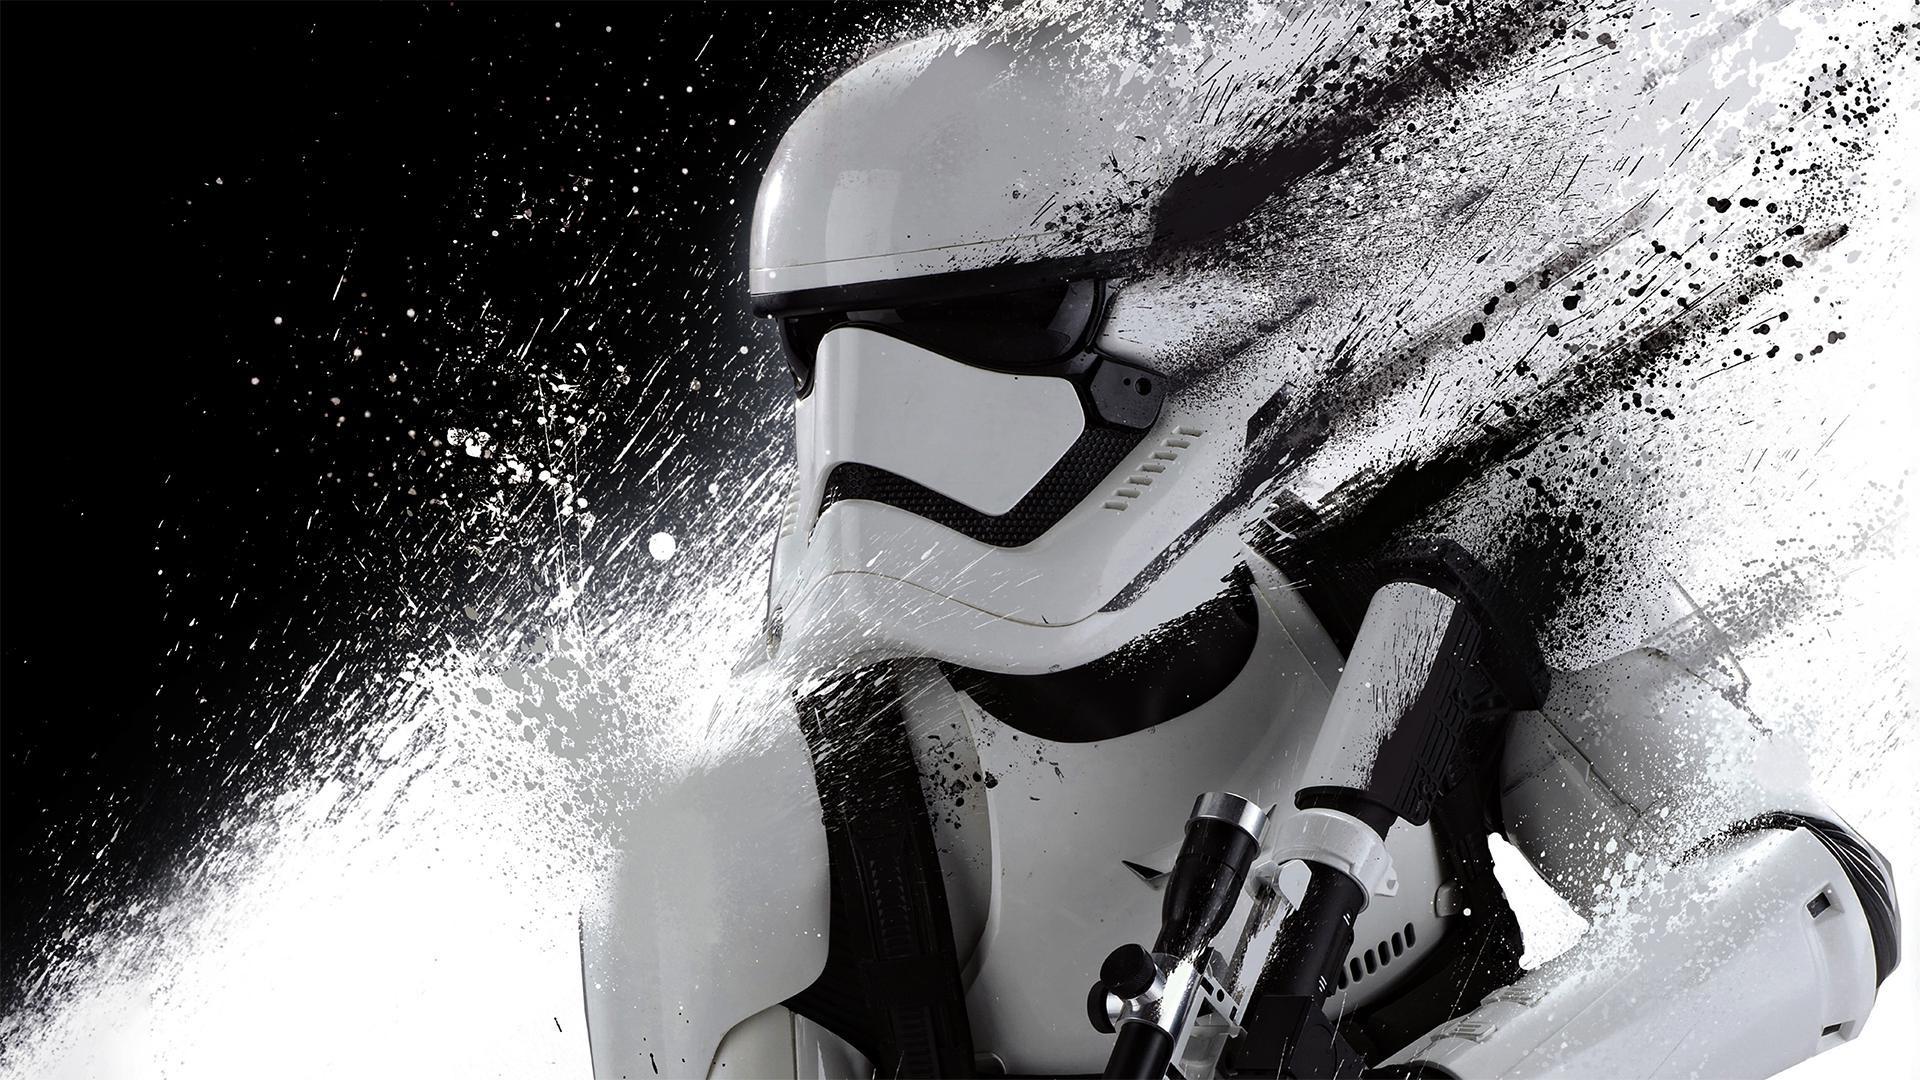 Star Wars, Stormtrooper Wallpapers HD / Desktop and Mobile Backgrounds